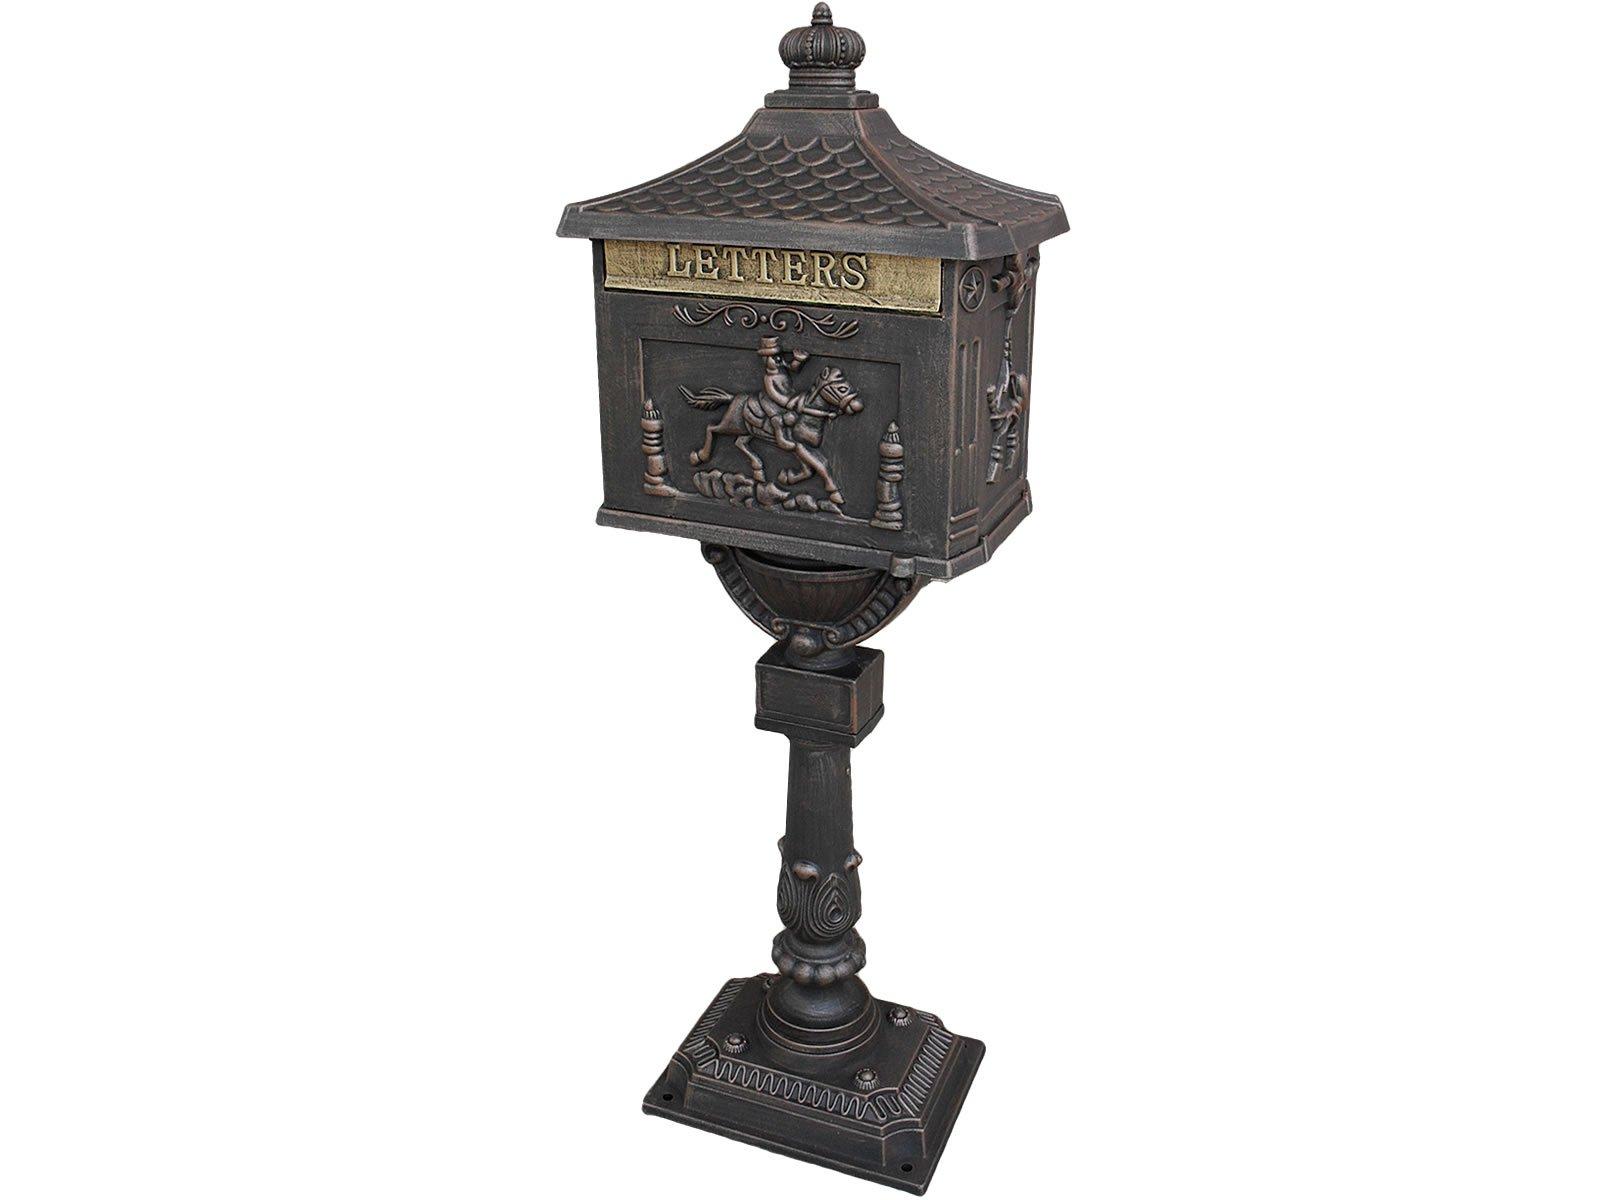 Giantex Heavy Duty Postal Box Security Aluminum Post/Pedestal Cast Mailbox Bronze by Giantex